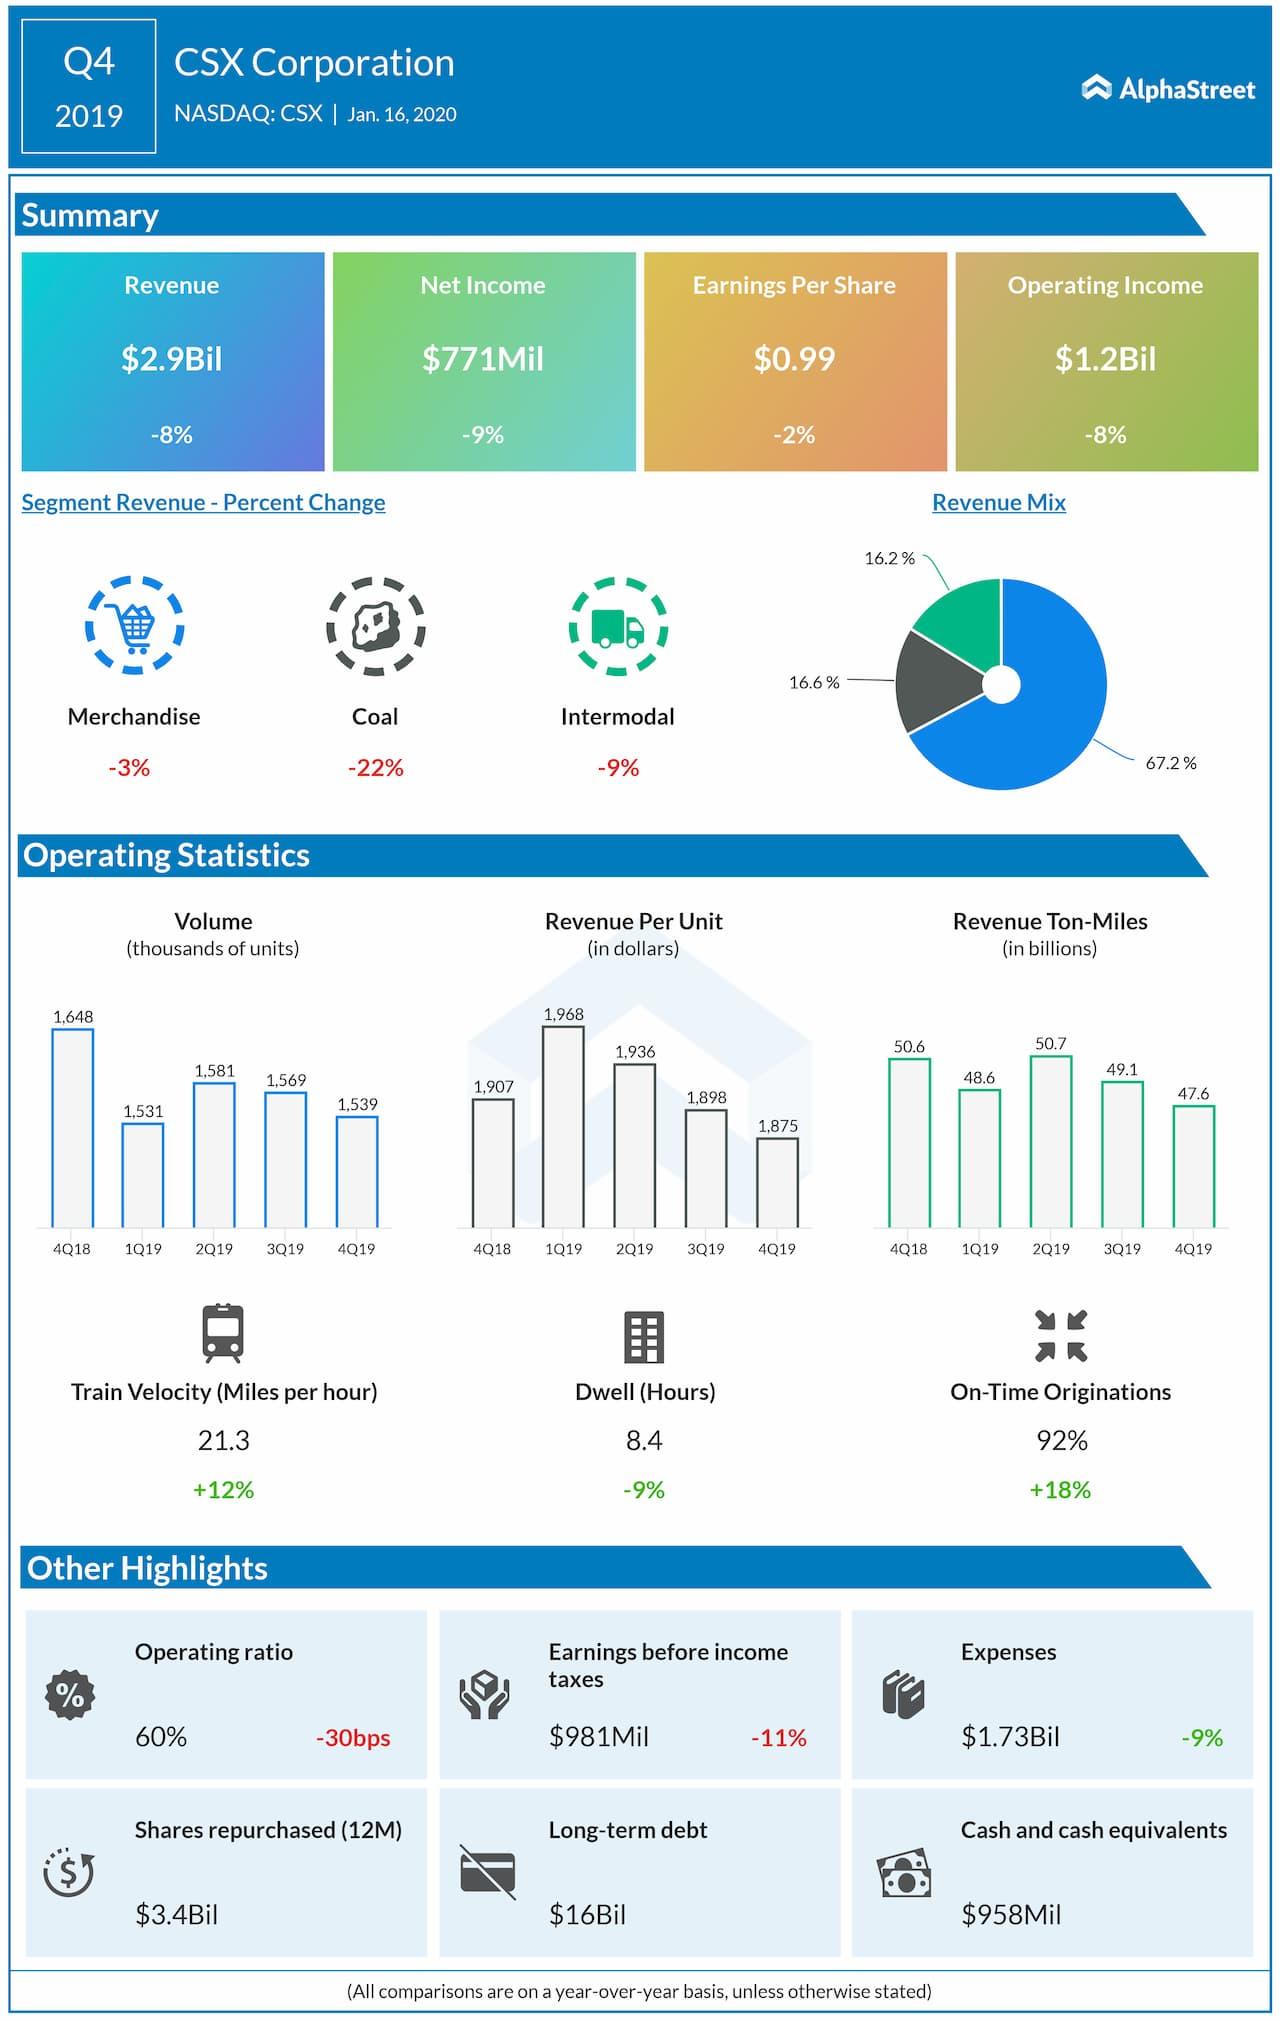 CSX Corporation (CSX) Q4 2019 Earnings Snapshot